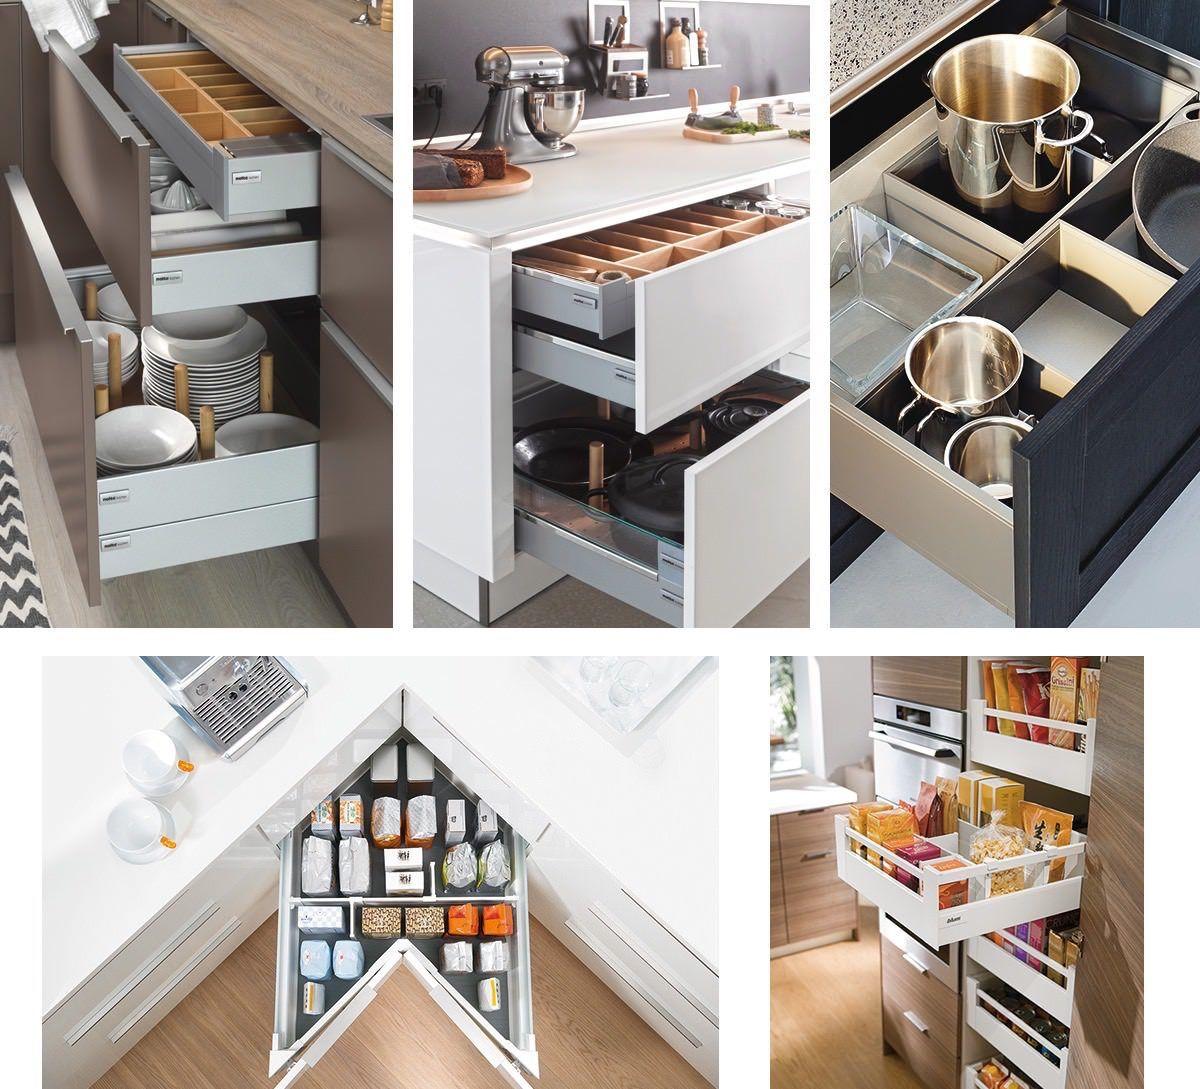 Keukenspecialist.nl bergruimte in de keuken